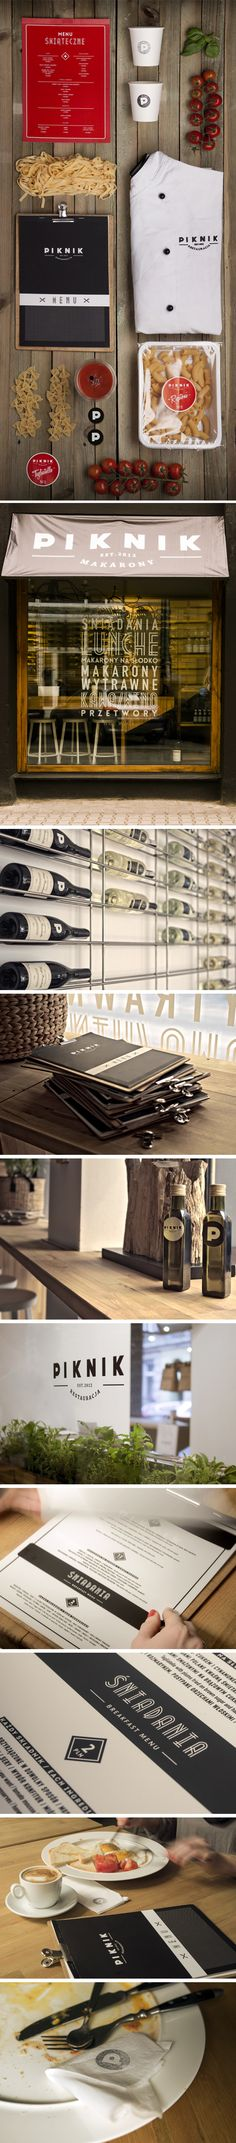 #restaurantgraphics #typography